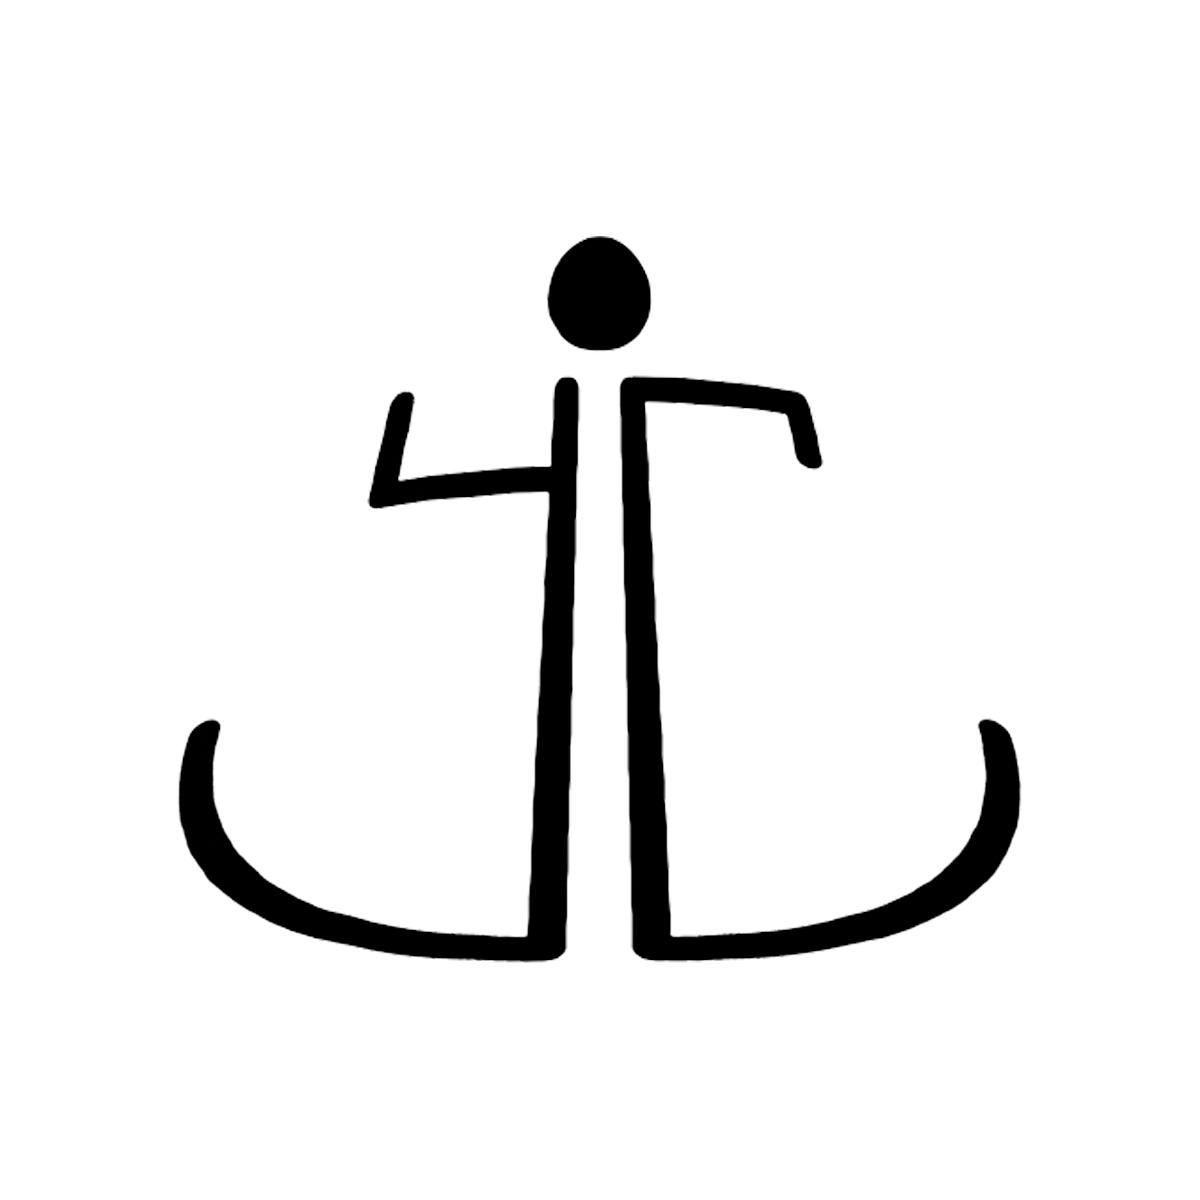 On Yachtly Crew